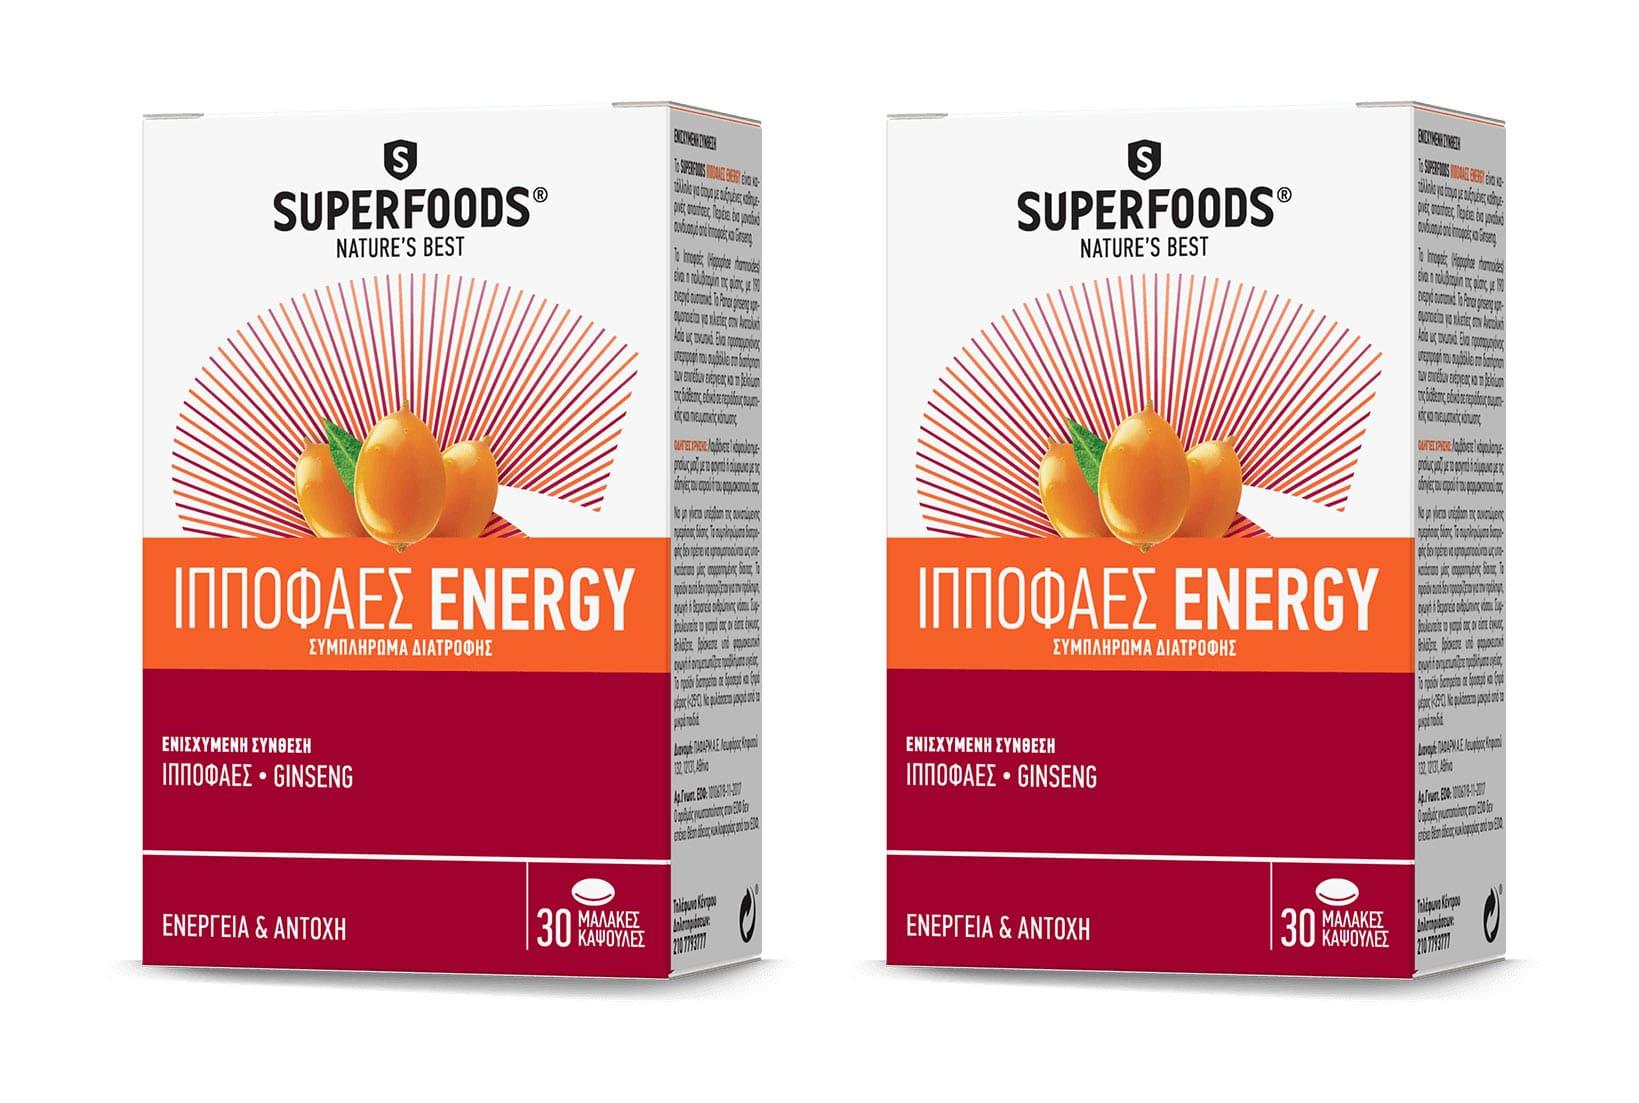 2x Superfoods Ιπποφαές Energy Συμπλήρωμα Διατροφής για άτομα με αυξημένες ΚαθημερινέςΑνάγκες, 2x 30caps